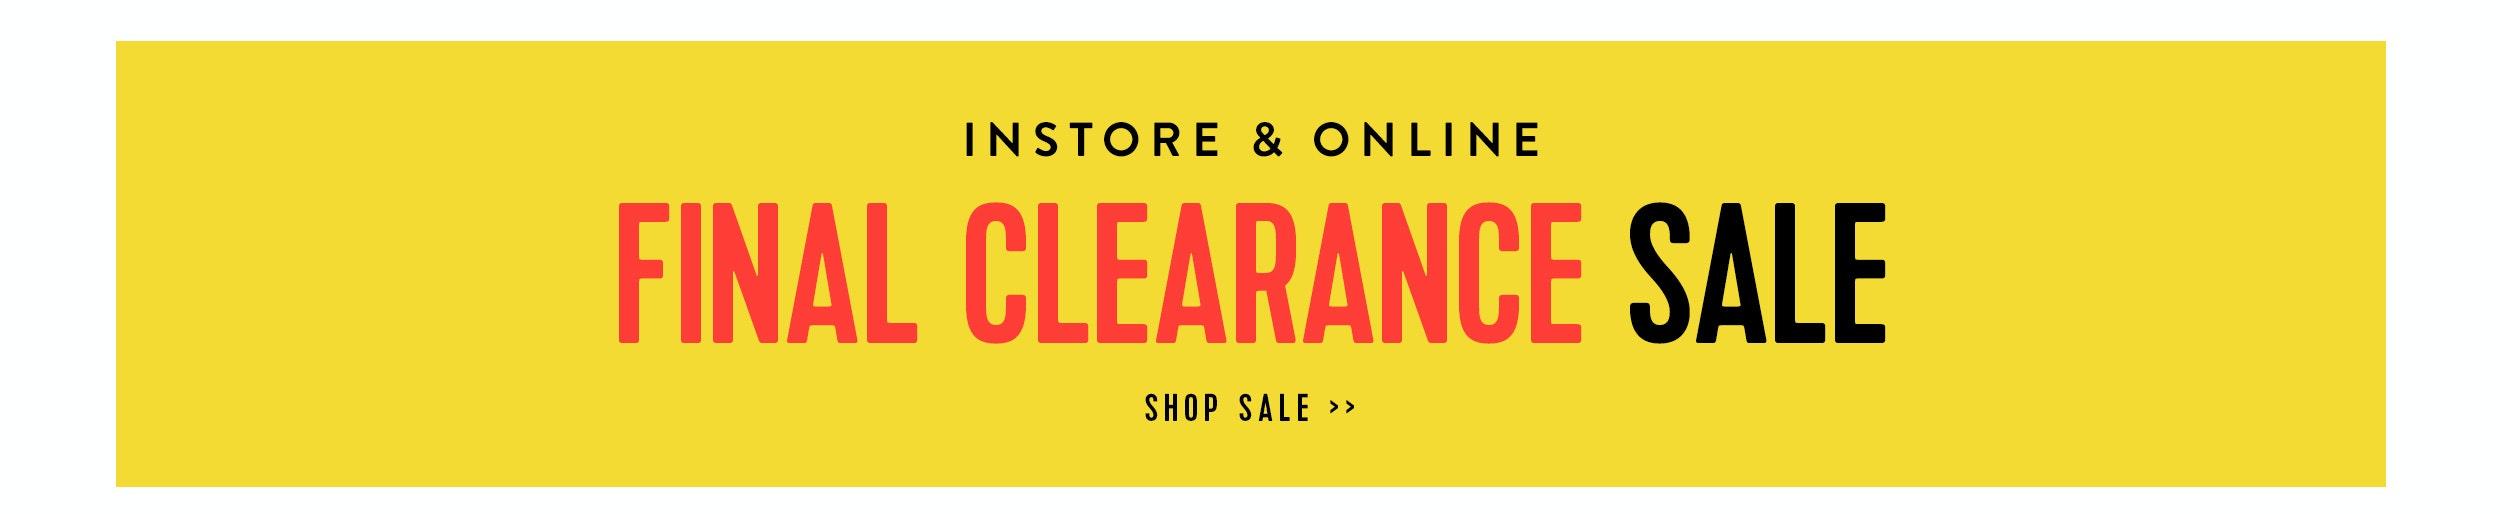 Shop Final Clearance